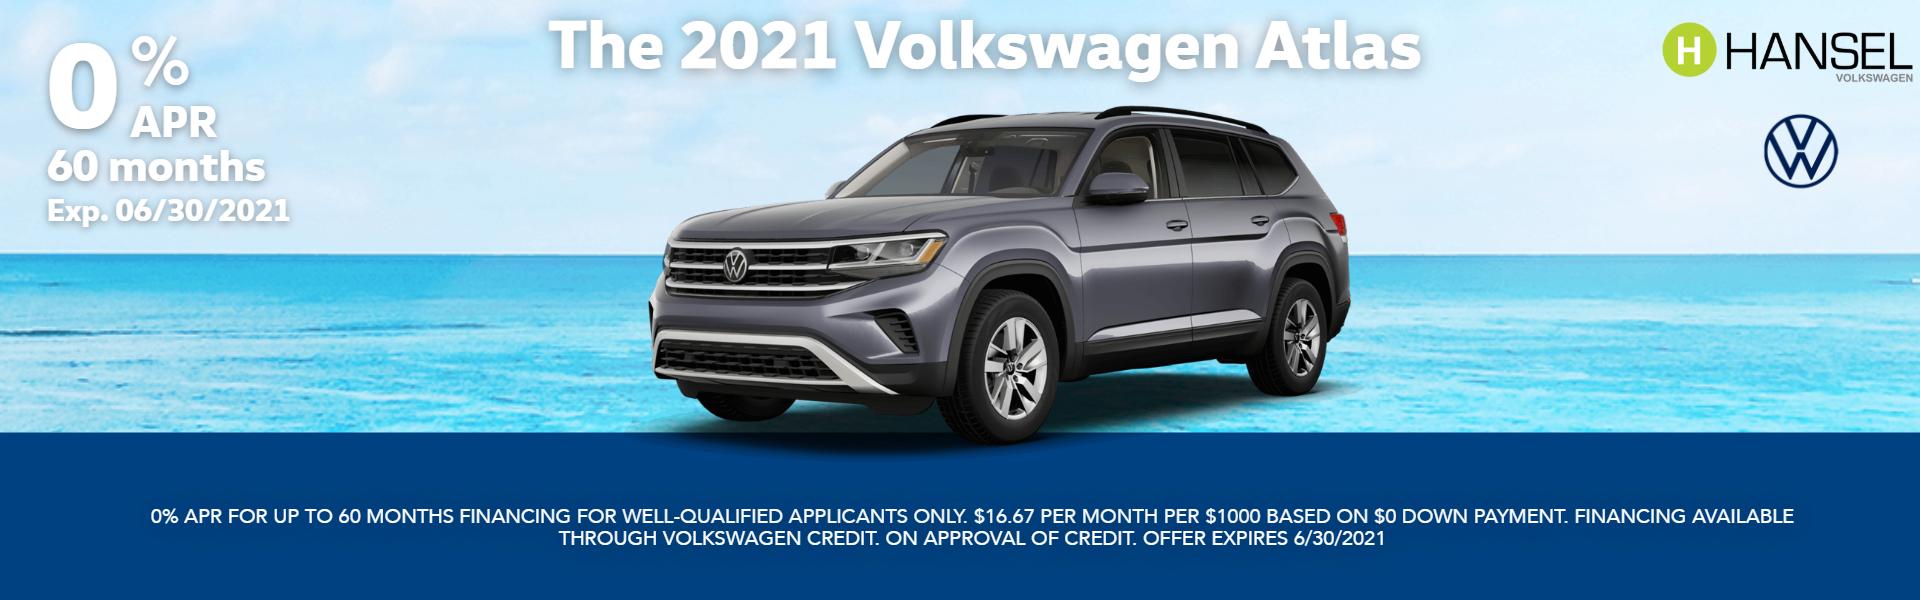 2021_Volkswagen_Atlas_S_Mon Jun 07 2021 11_19_01 GMT-0700 (Pacific Daylight Time)